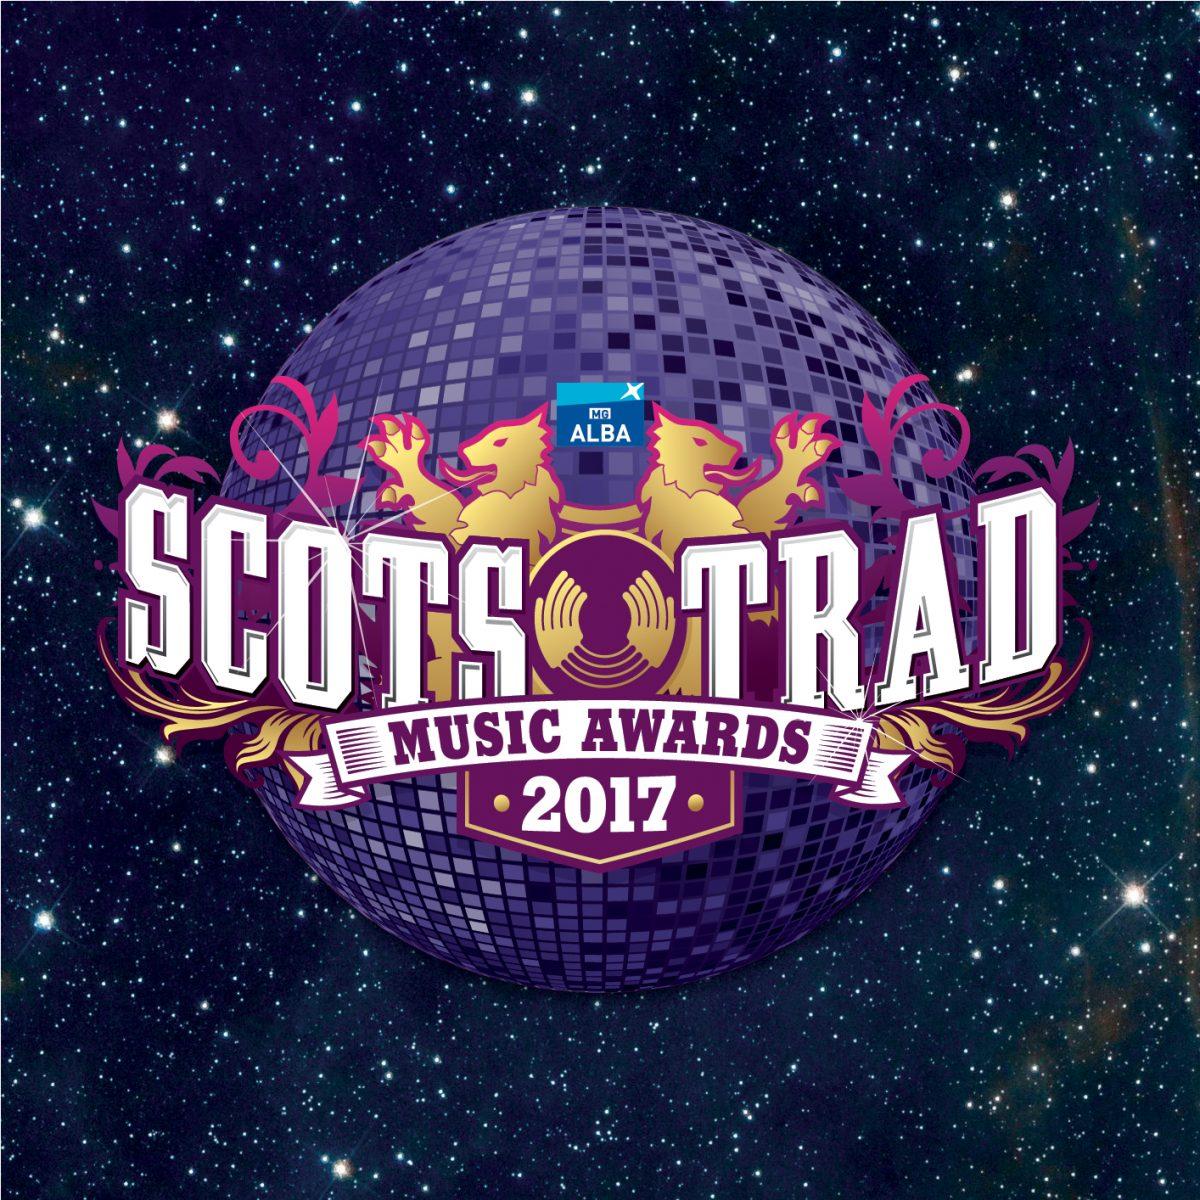 Scots Trad Music Awards 2017